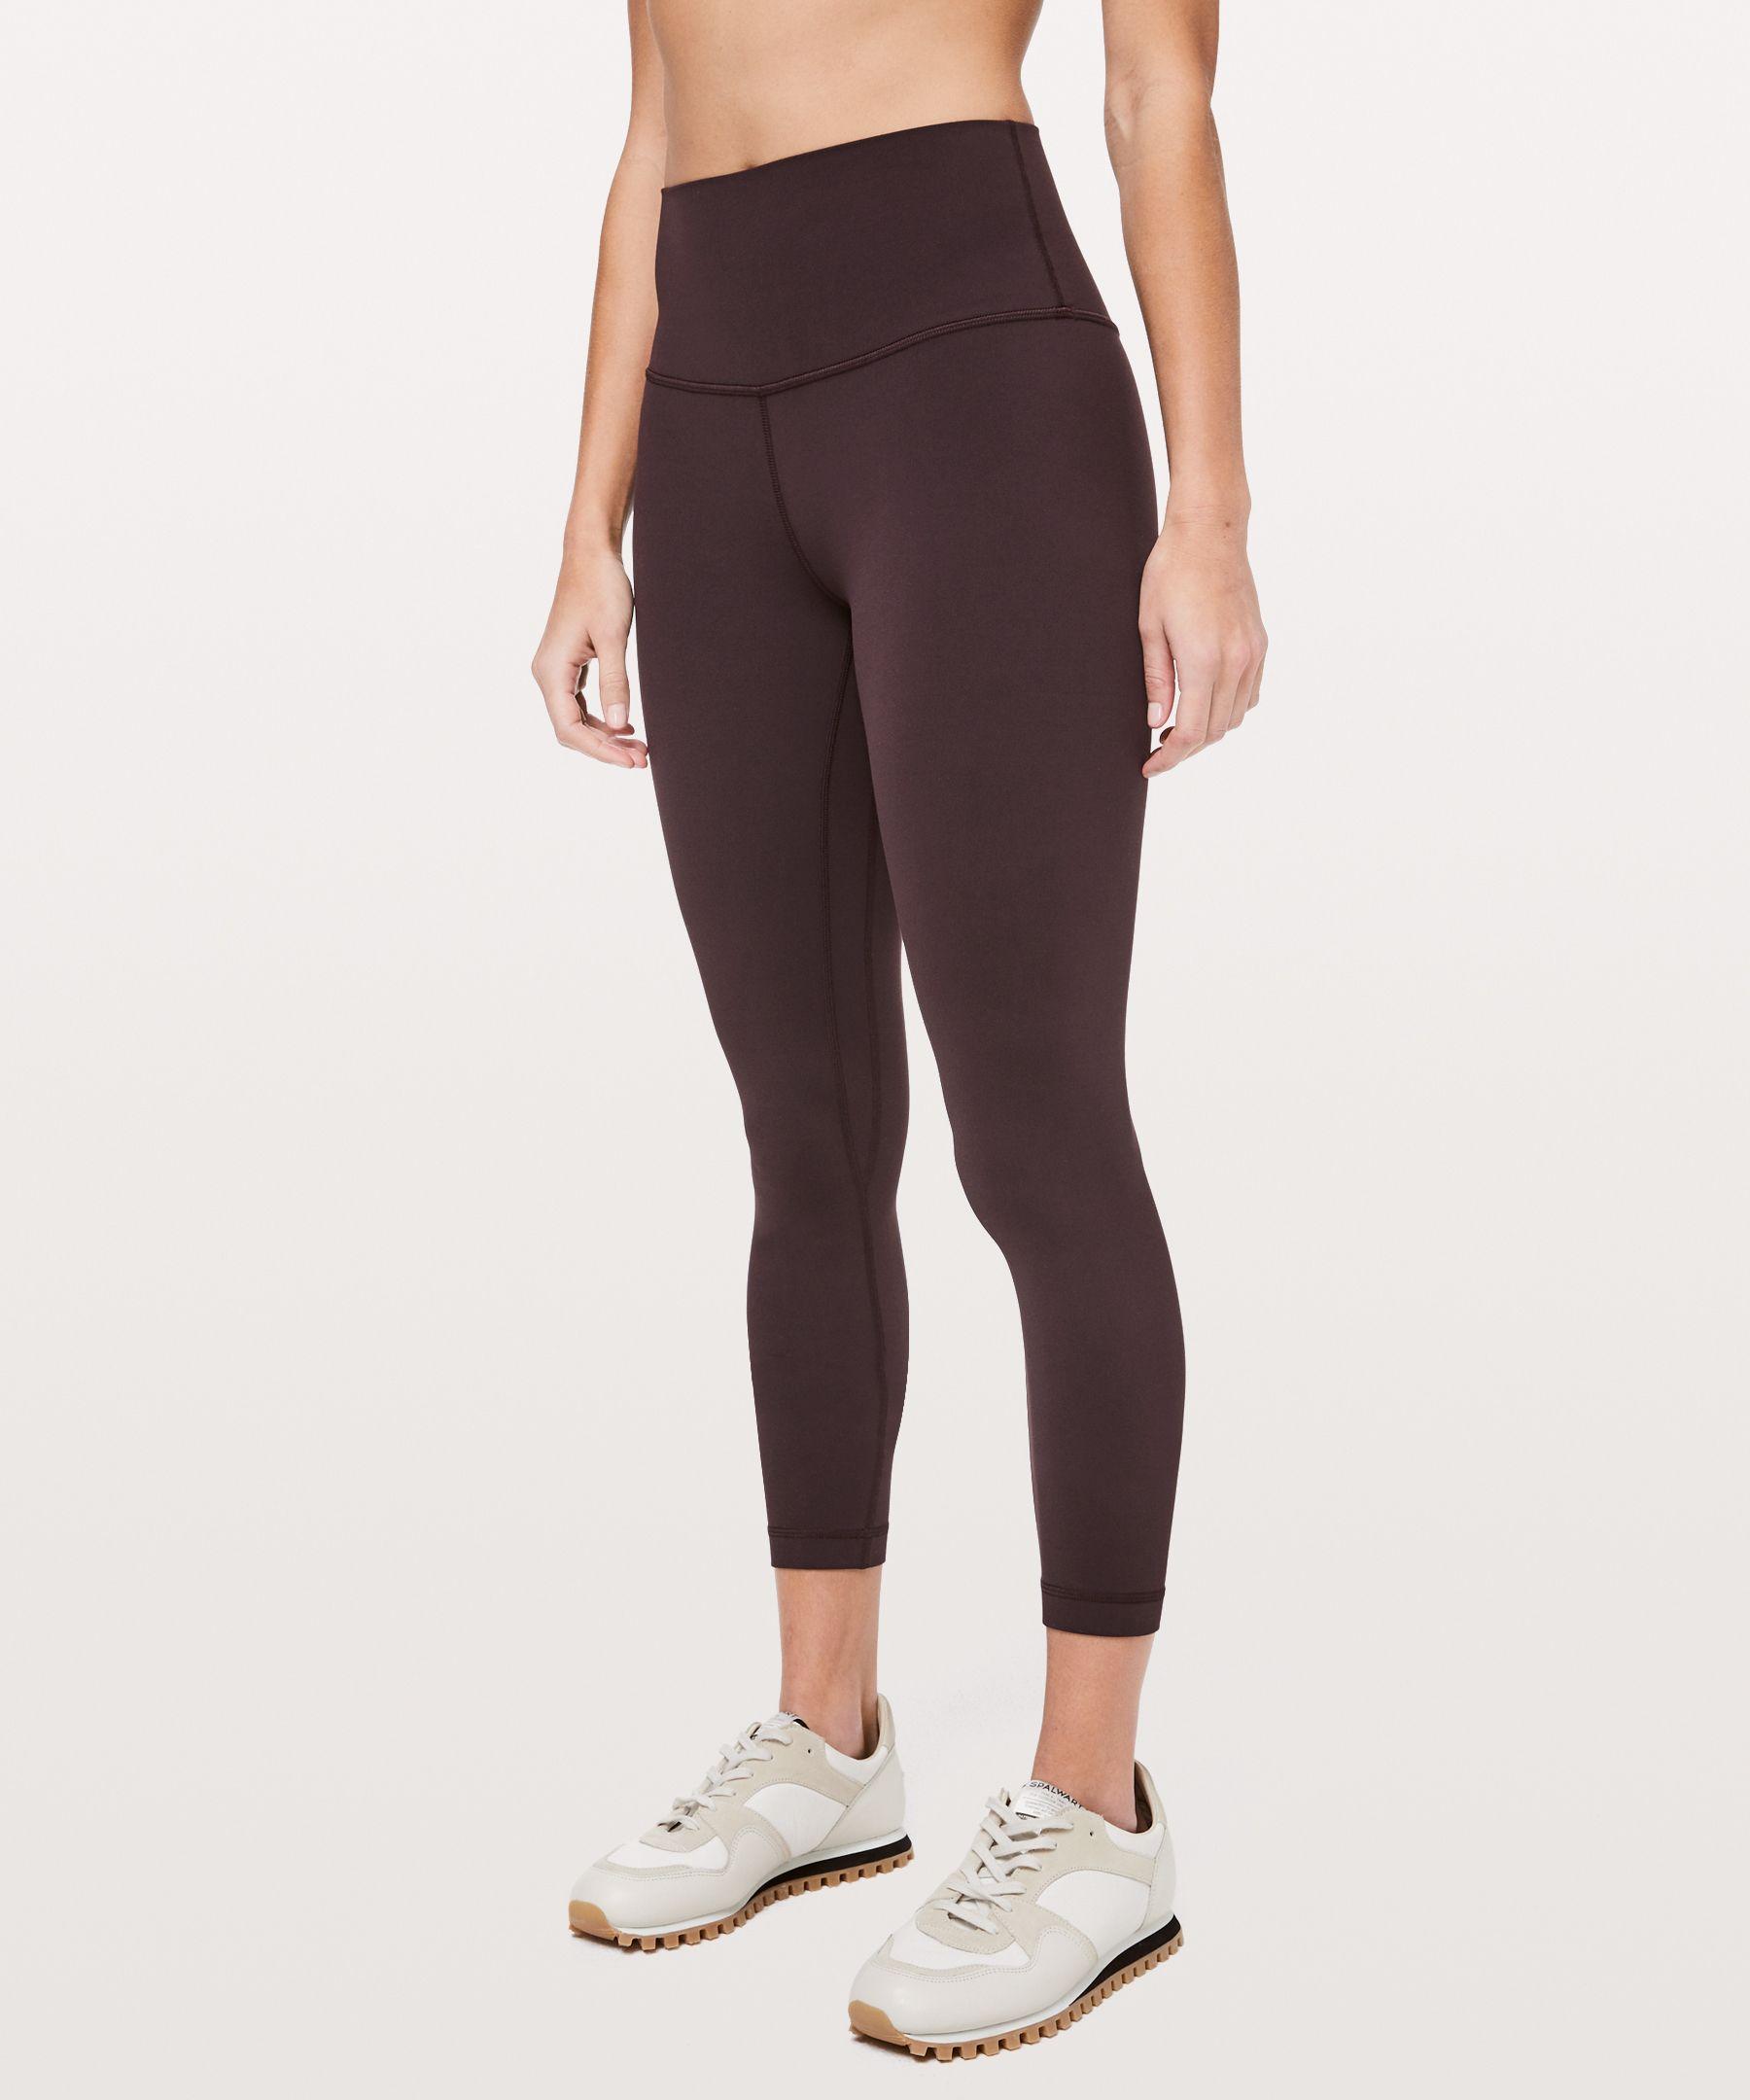 Align Pant Ii 25 Quot Women S Yoga Pants Lululemon Athletica